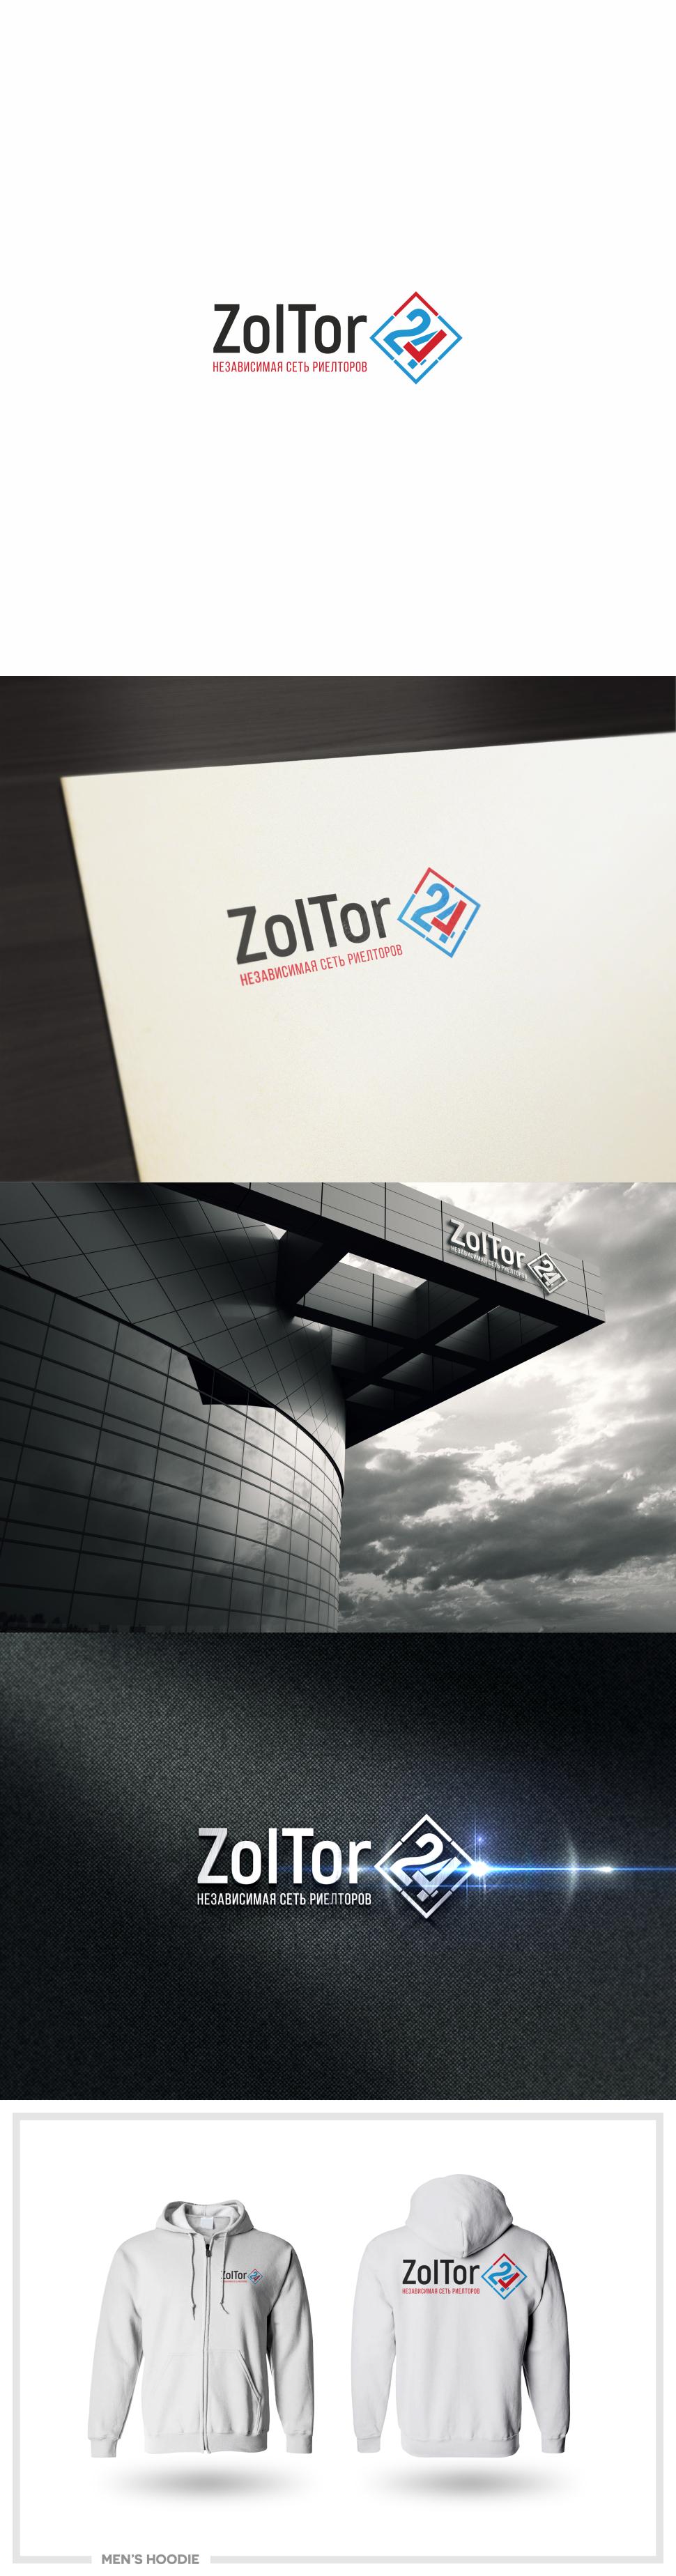 Логотип и фирменный стиль ZolTor24 фото f_9165c960be49175f.jpg